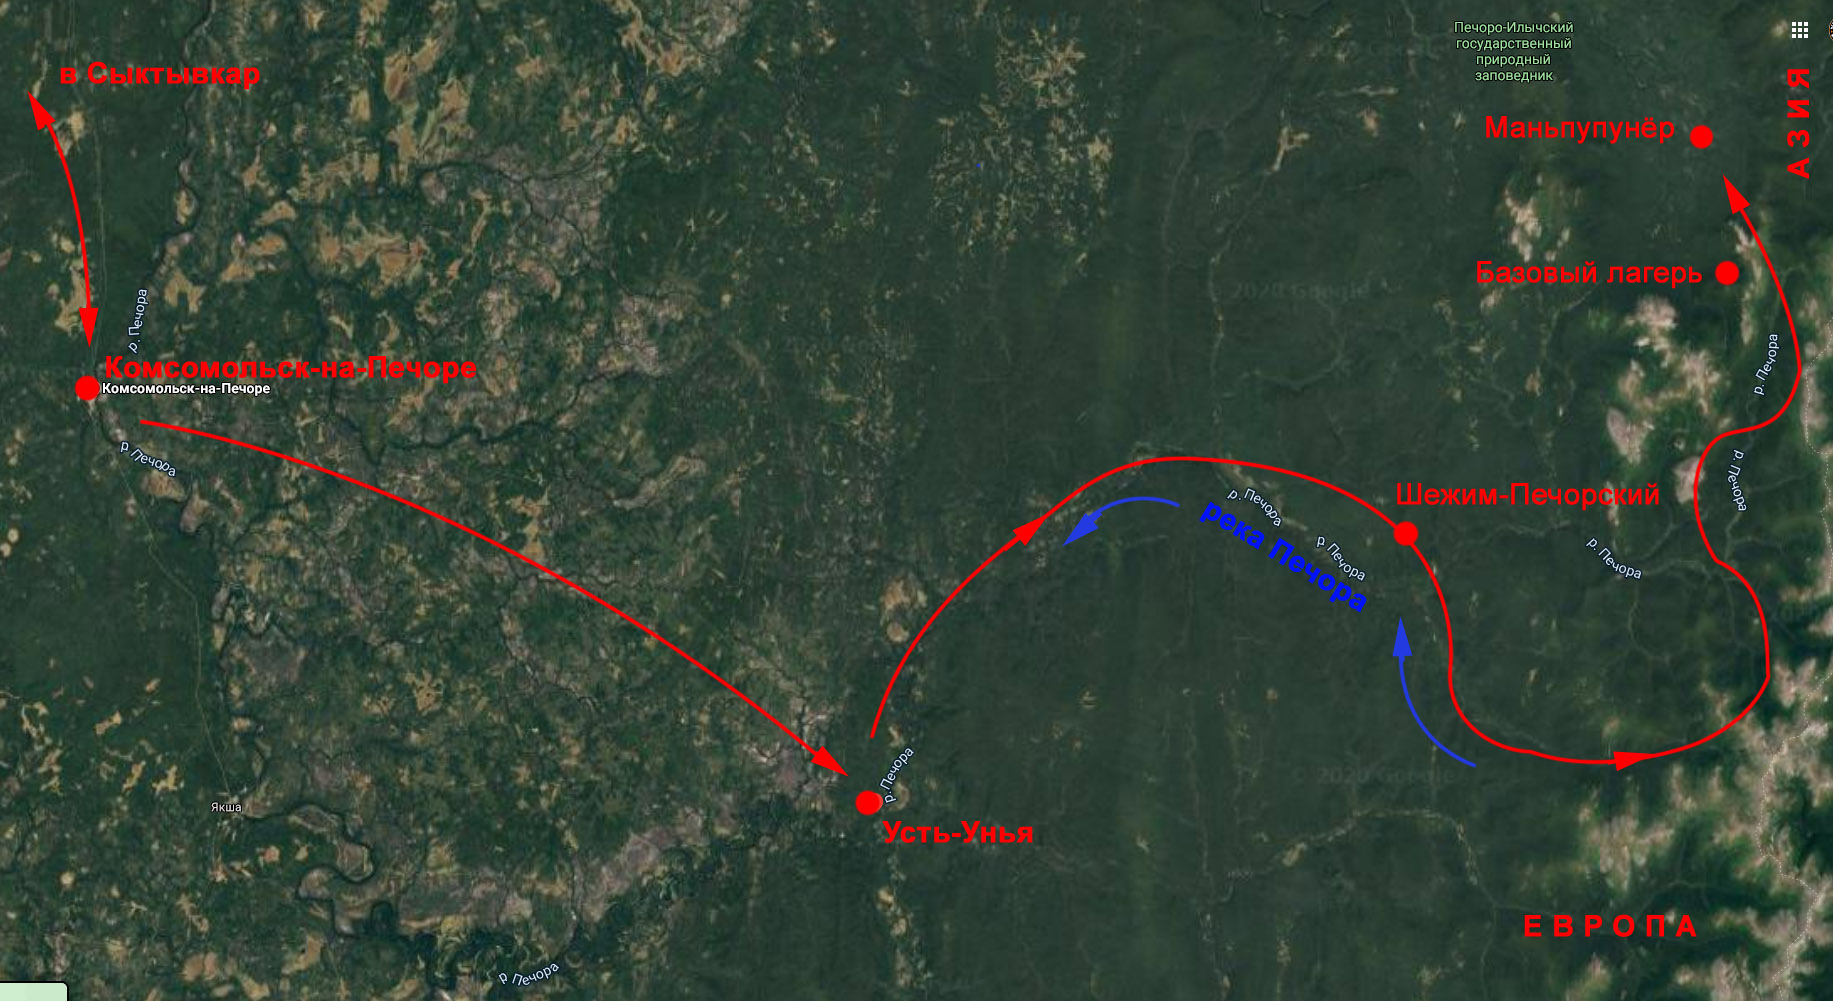 Схема маршрута к утёсам Маньпупунёр